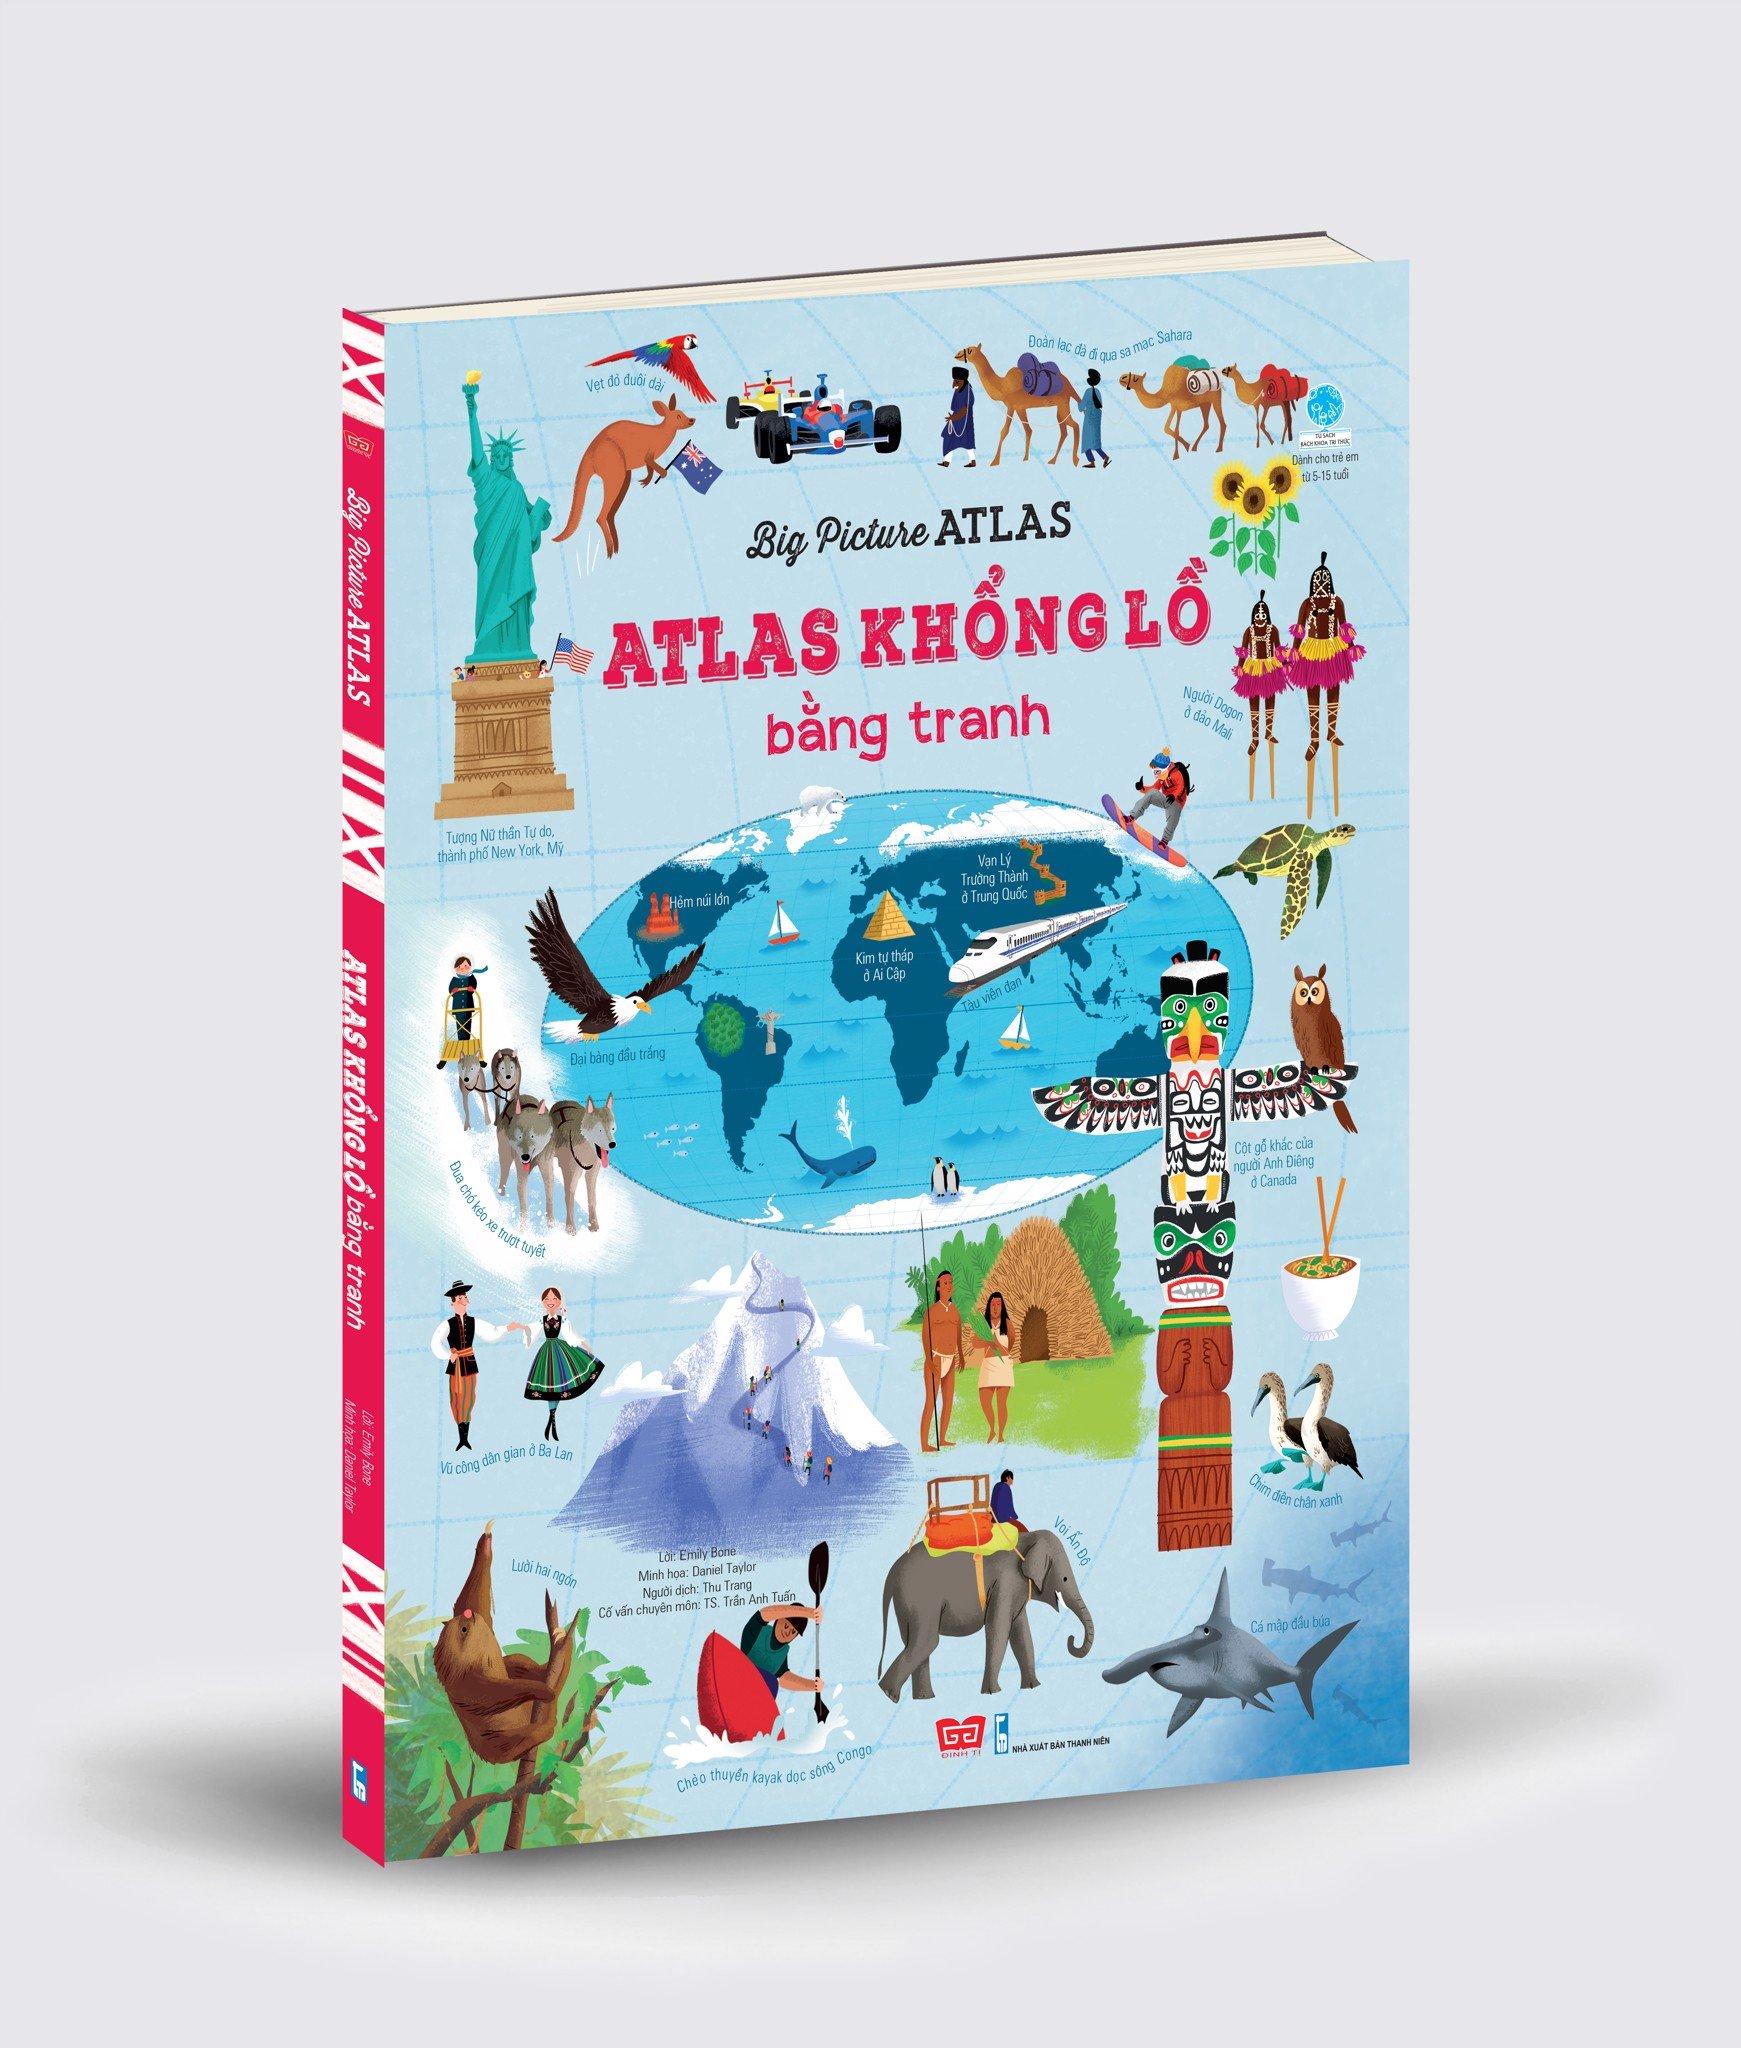 Big Picture Atlas - Atlas khổng lồ bằng tranh